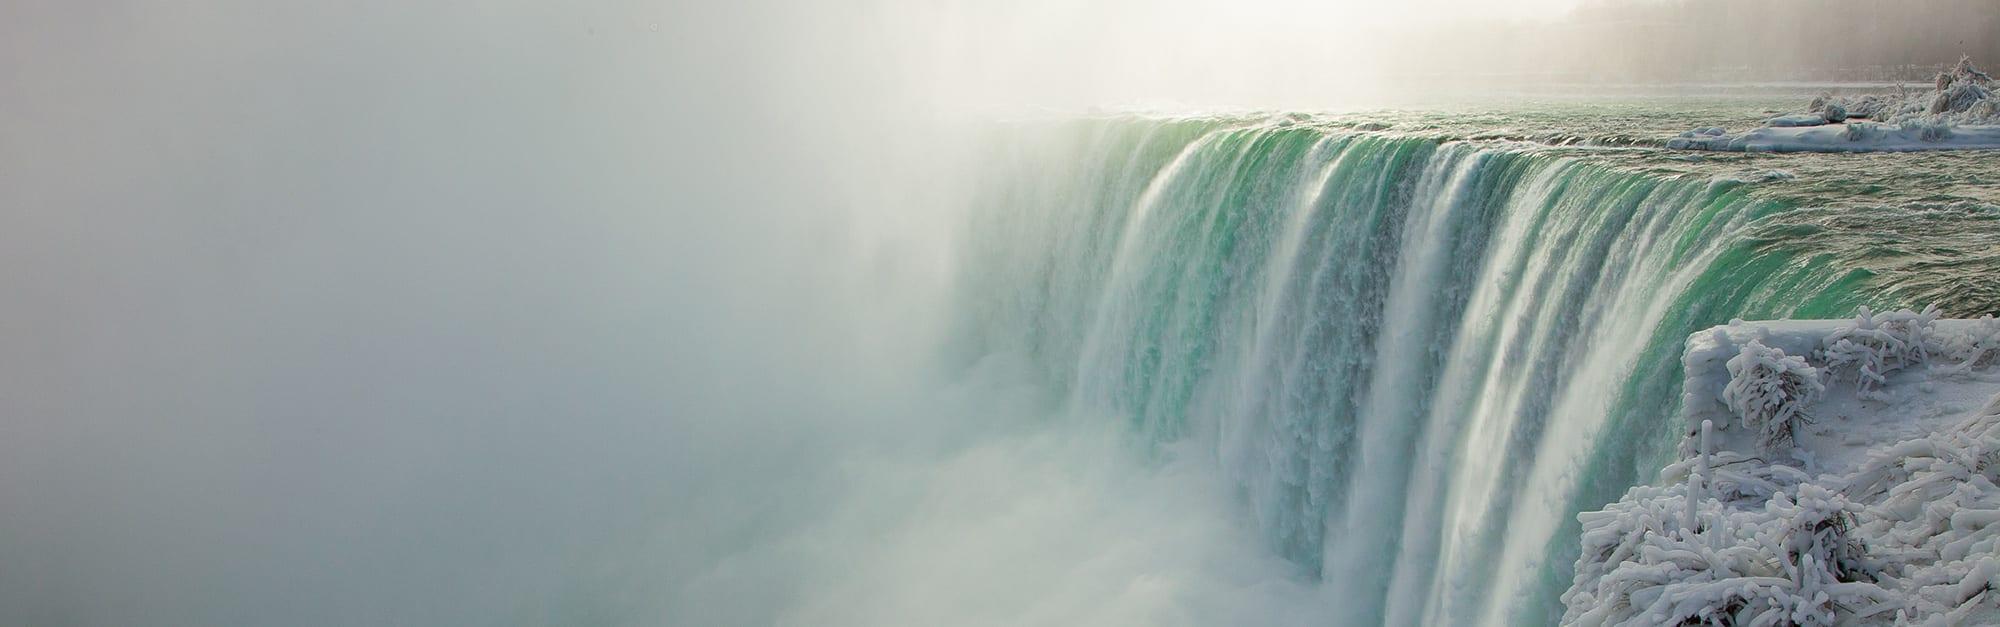 Niagara Falls on a wintry day